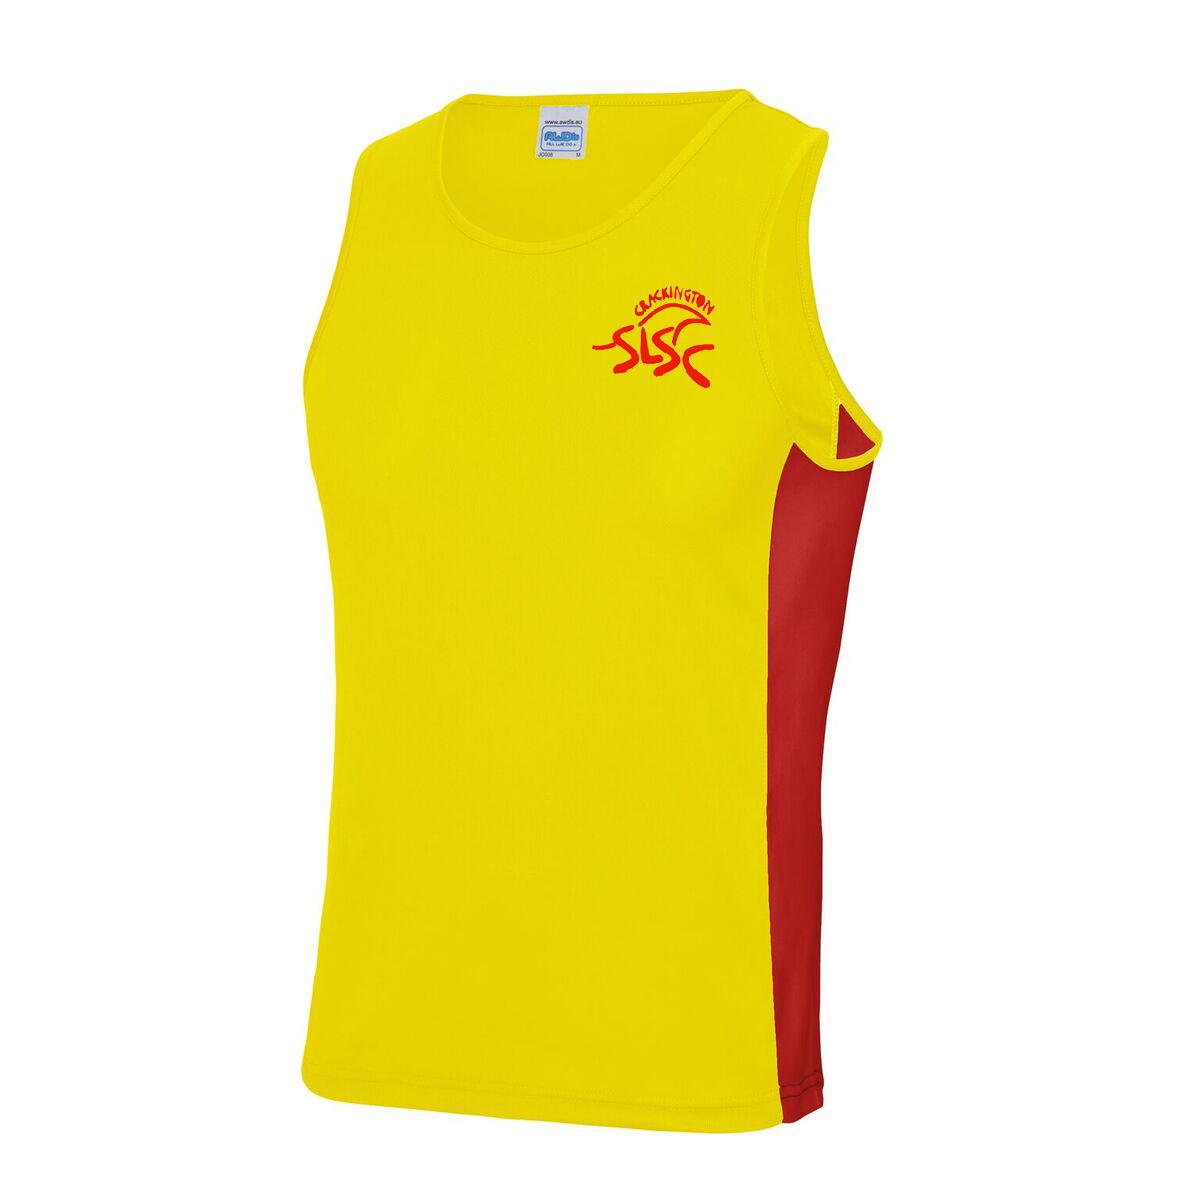 Crackington SLSC Sports Vest